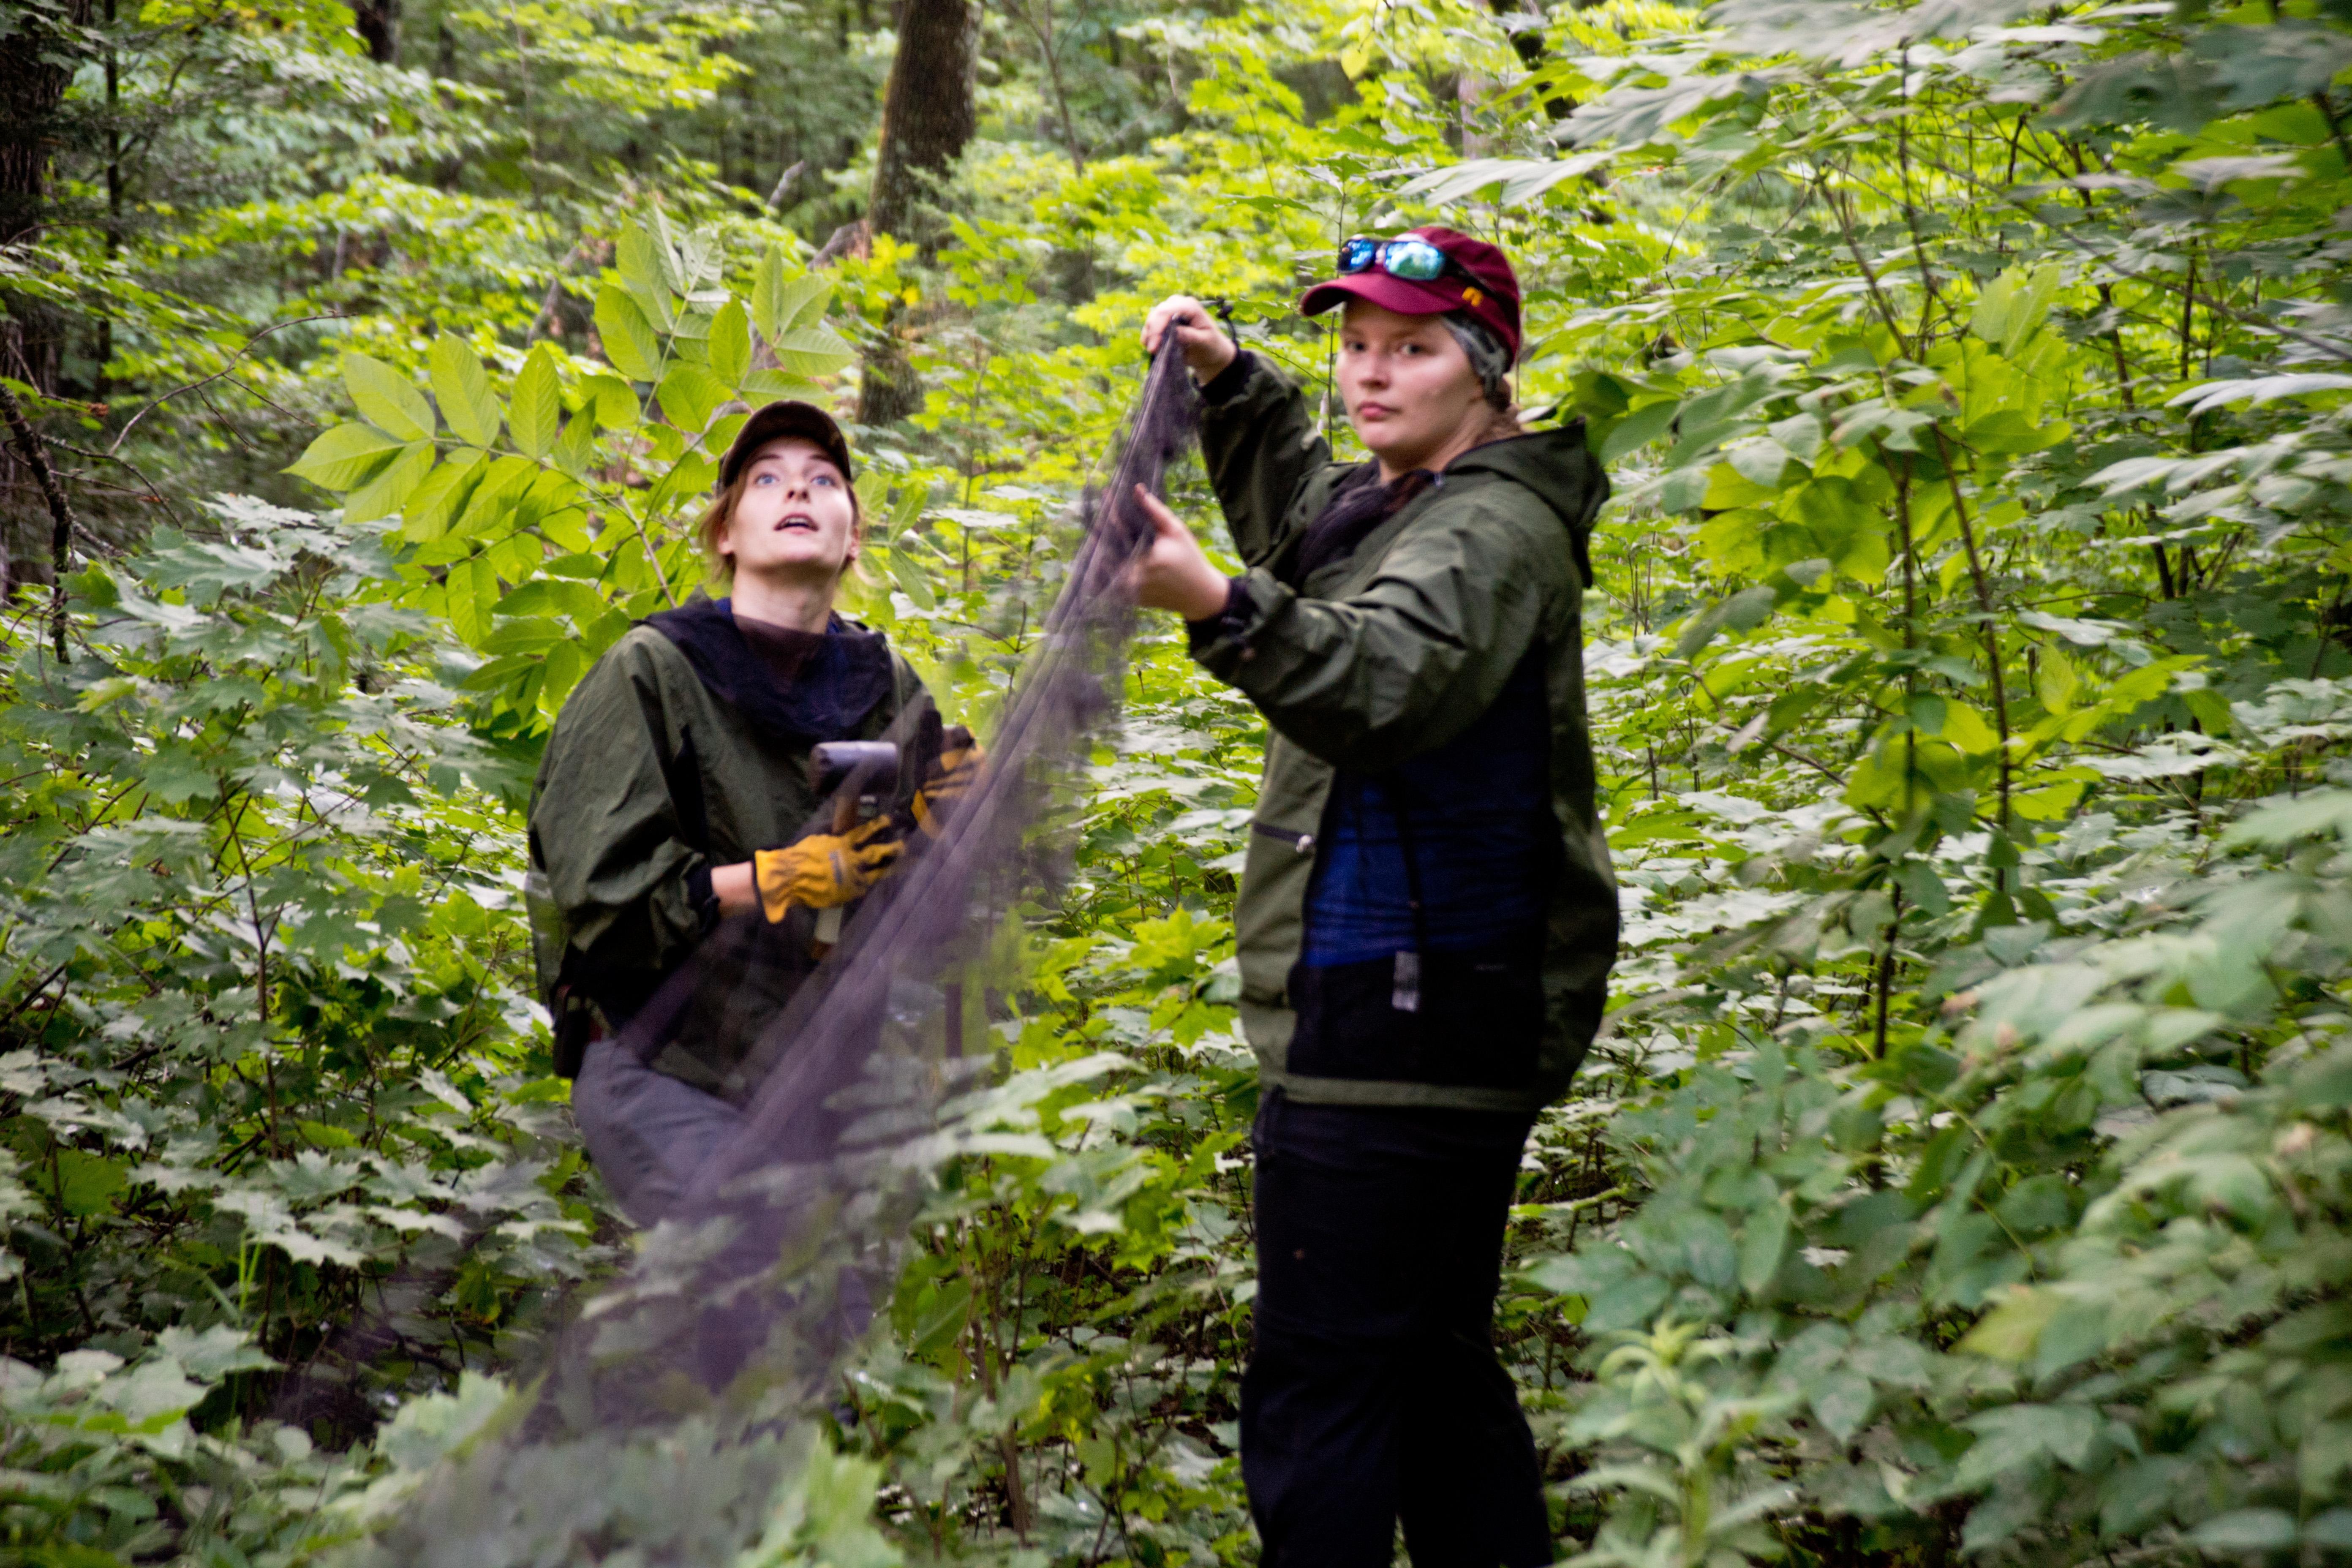 NRRI researchers set up nets to catch bats